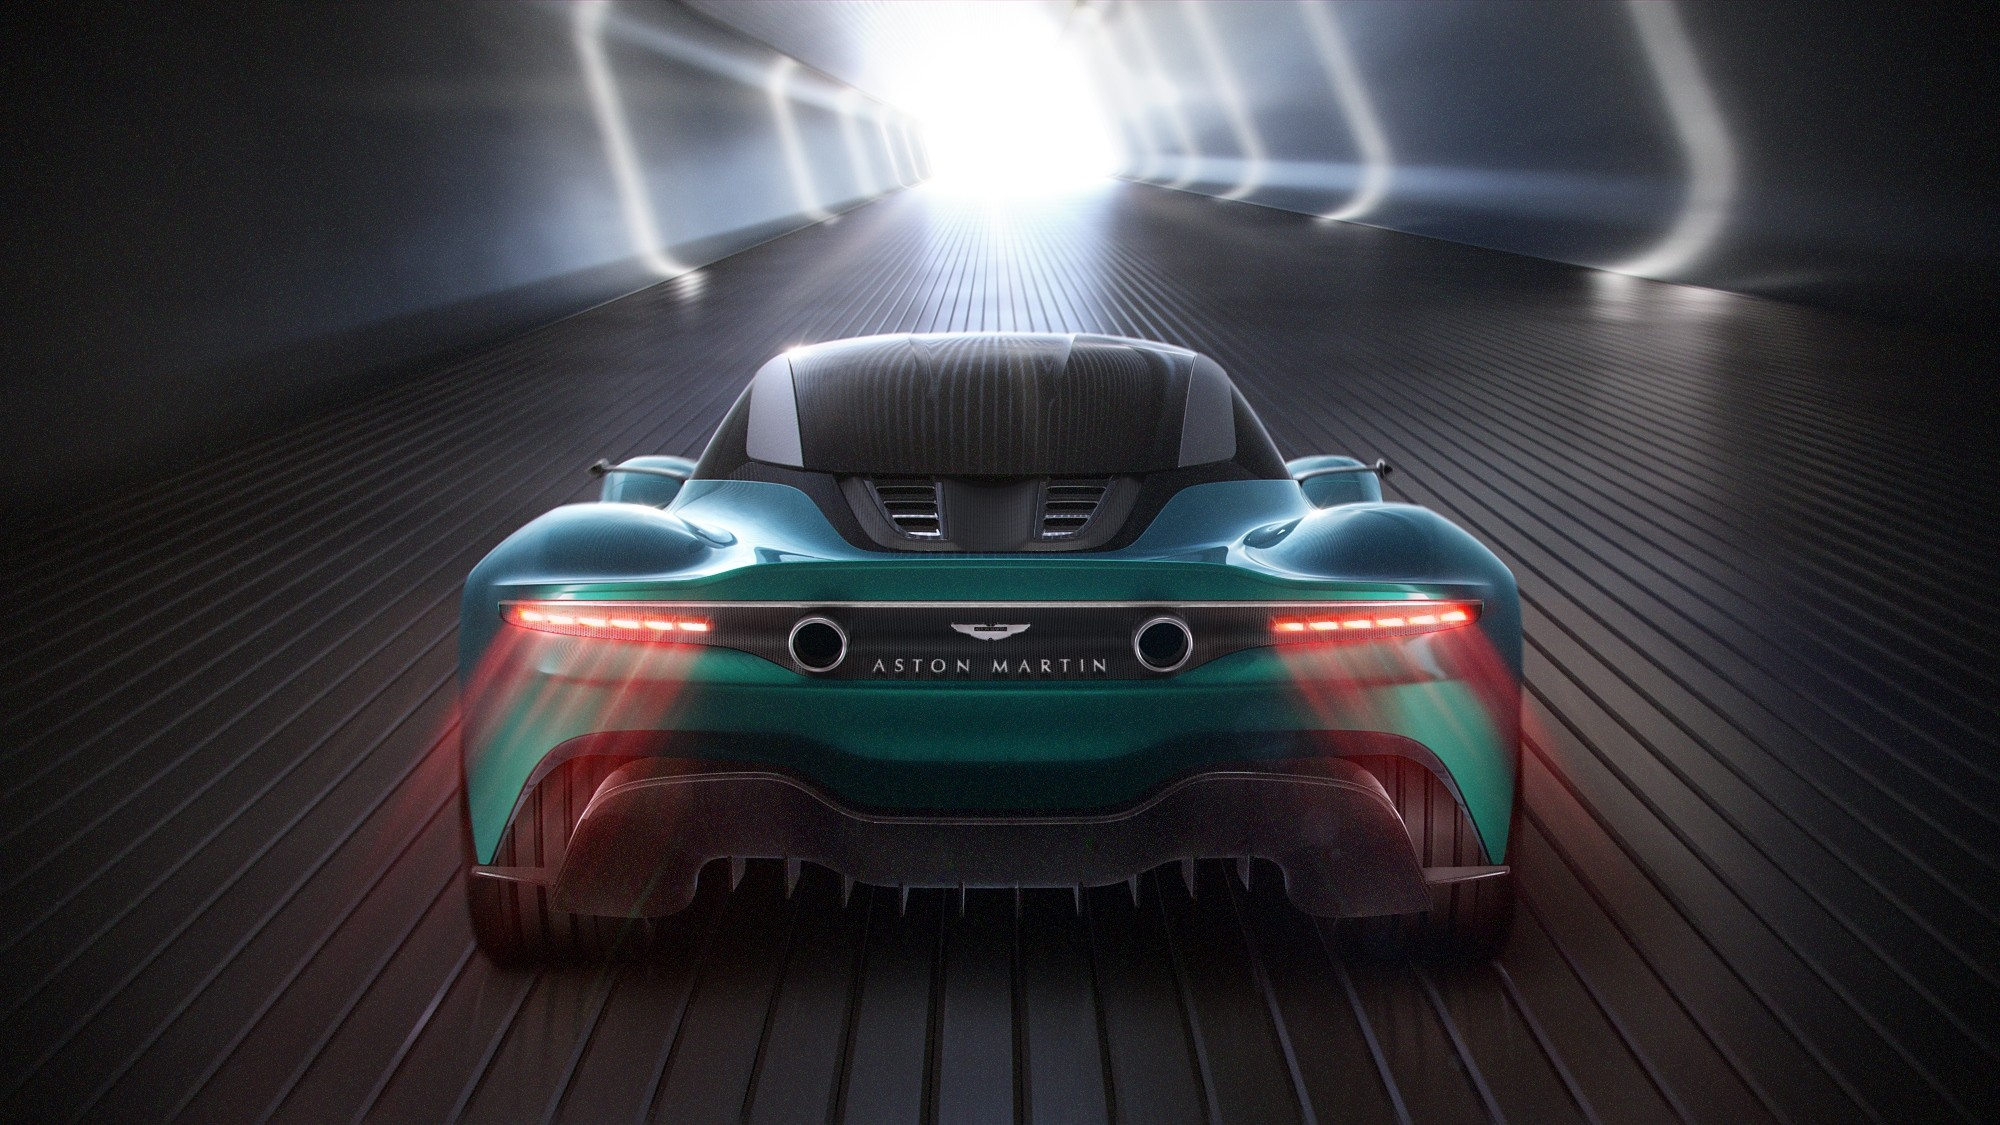 Aston Martin Vanquish Amr Pro Planned Vanquish Volante Also Confirmed Autoevolution